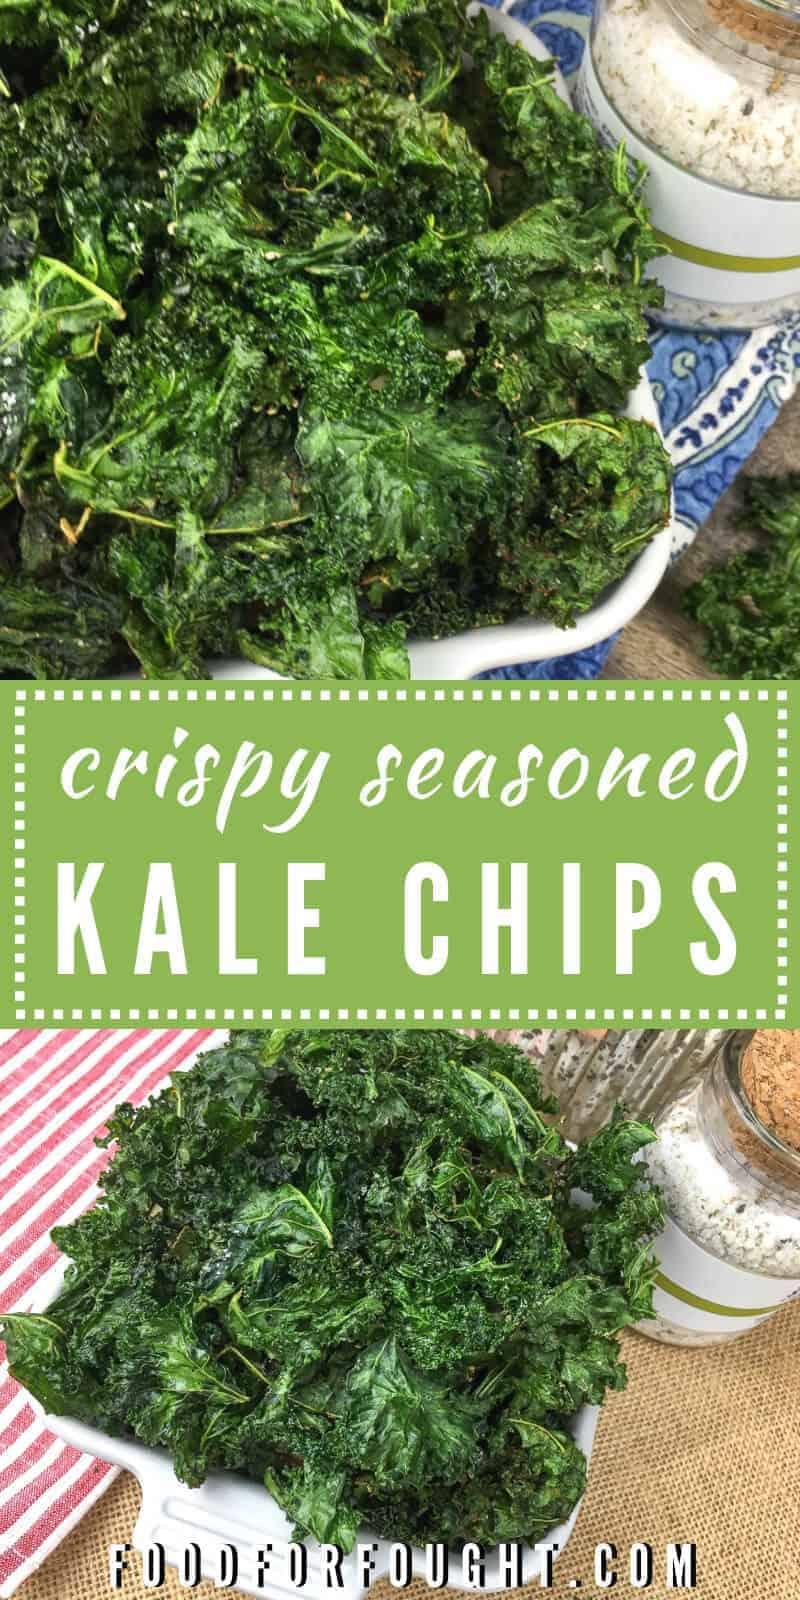 Crispy Seasoned Kale Chips Recipe on FoodForFought.com